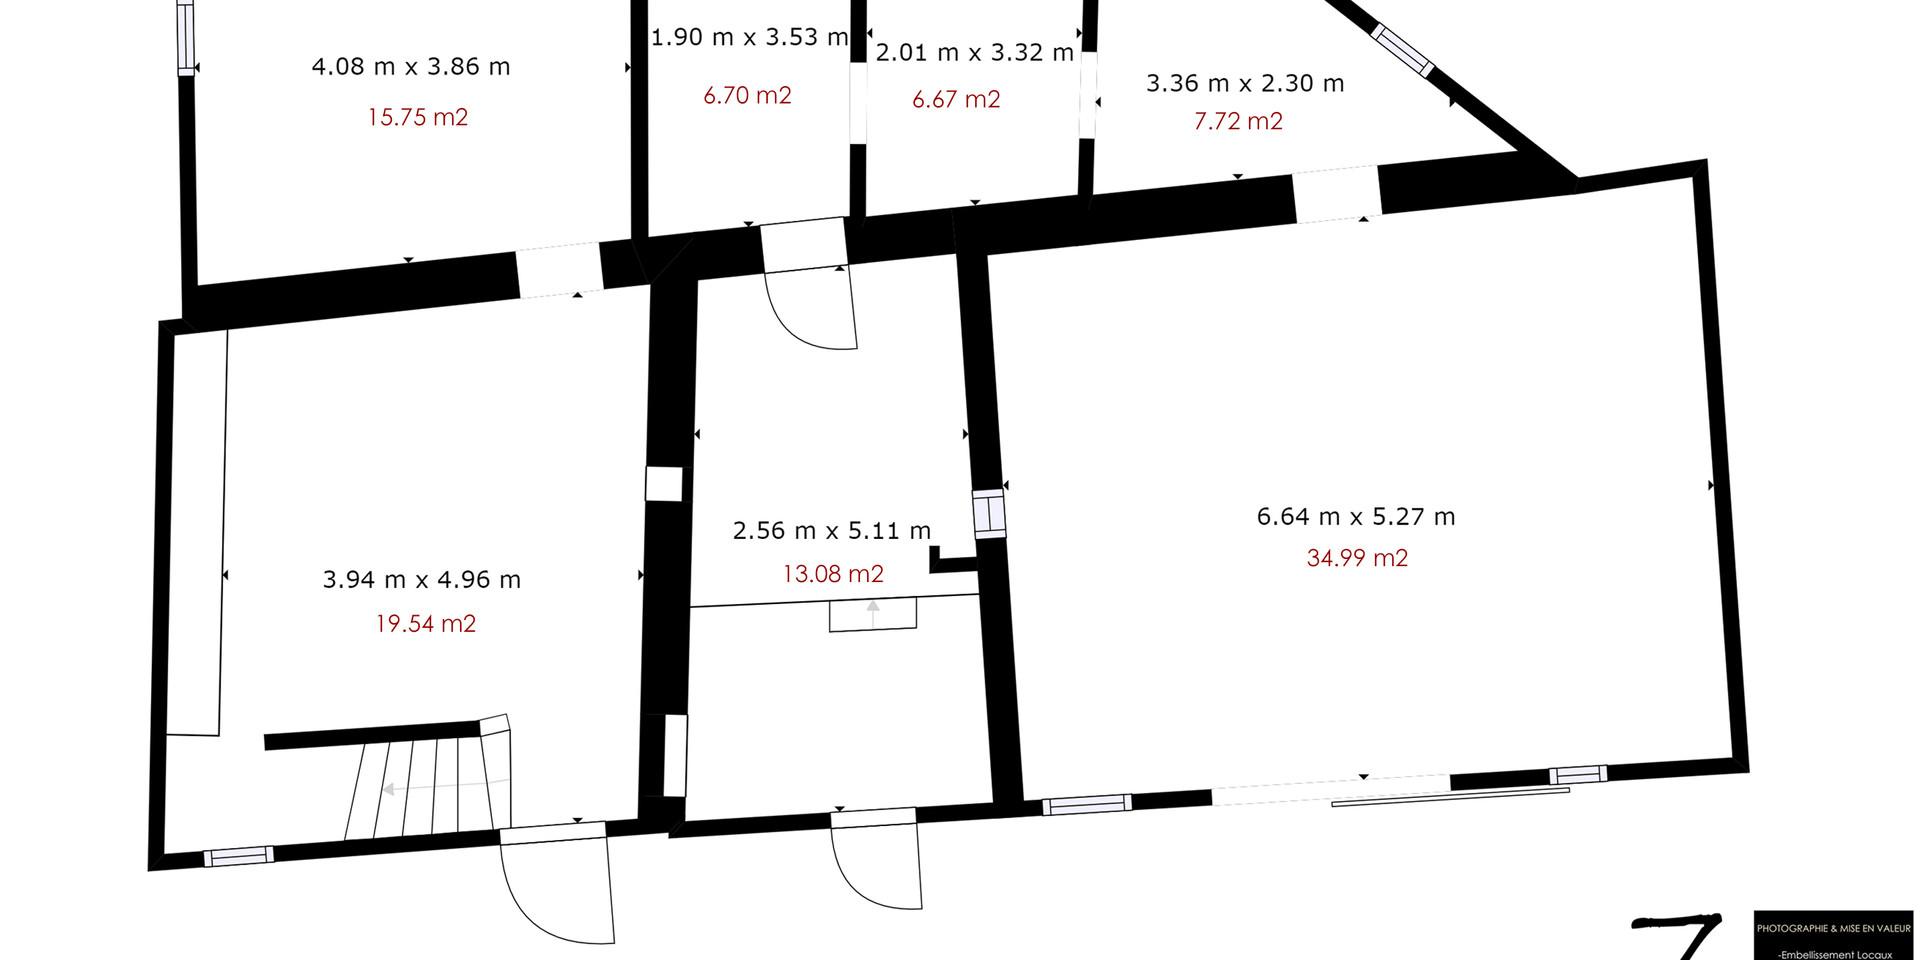 plans_scan_3d_agencevz_matterport